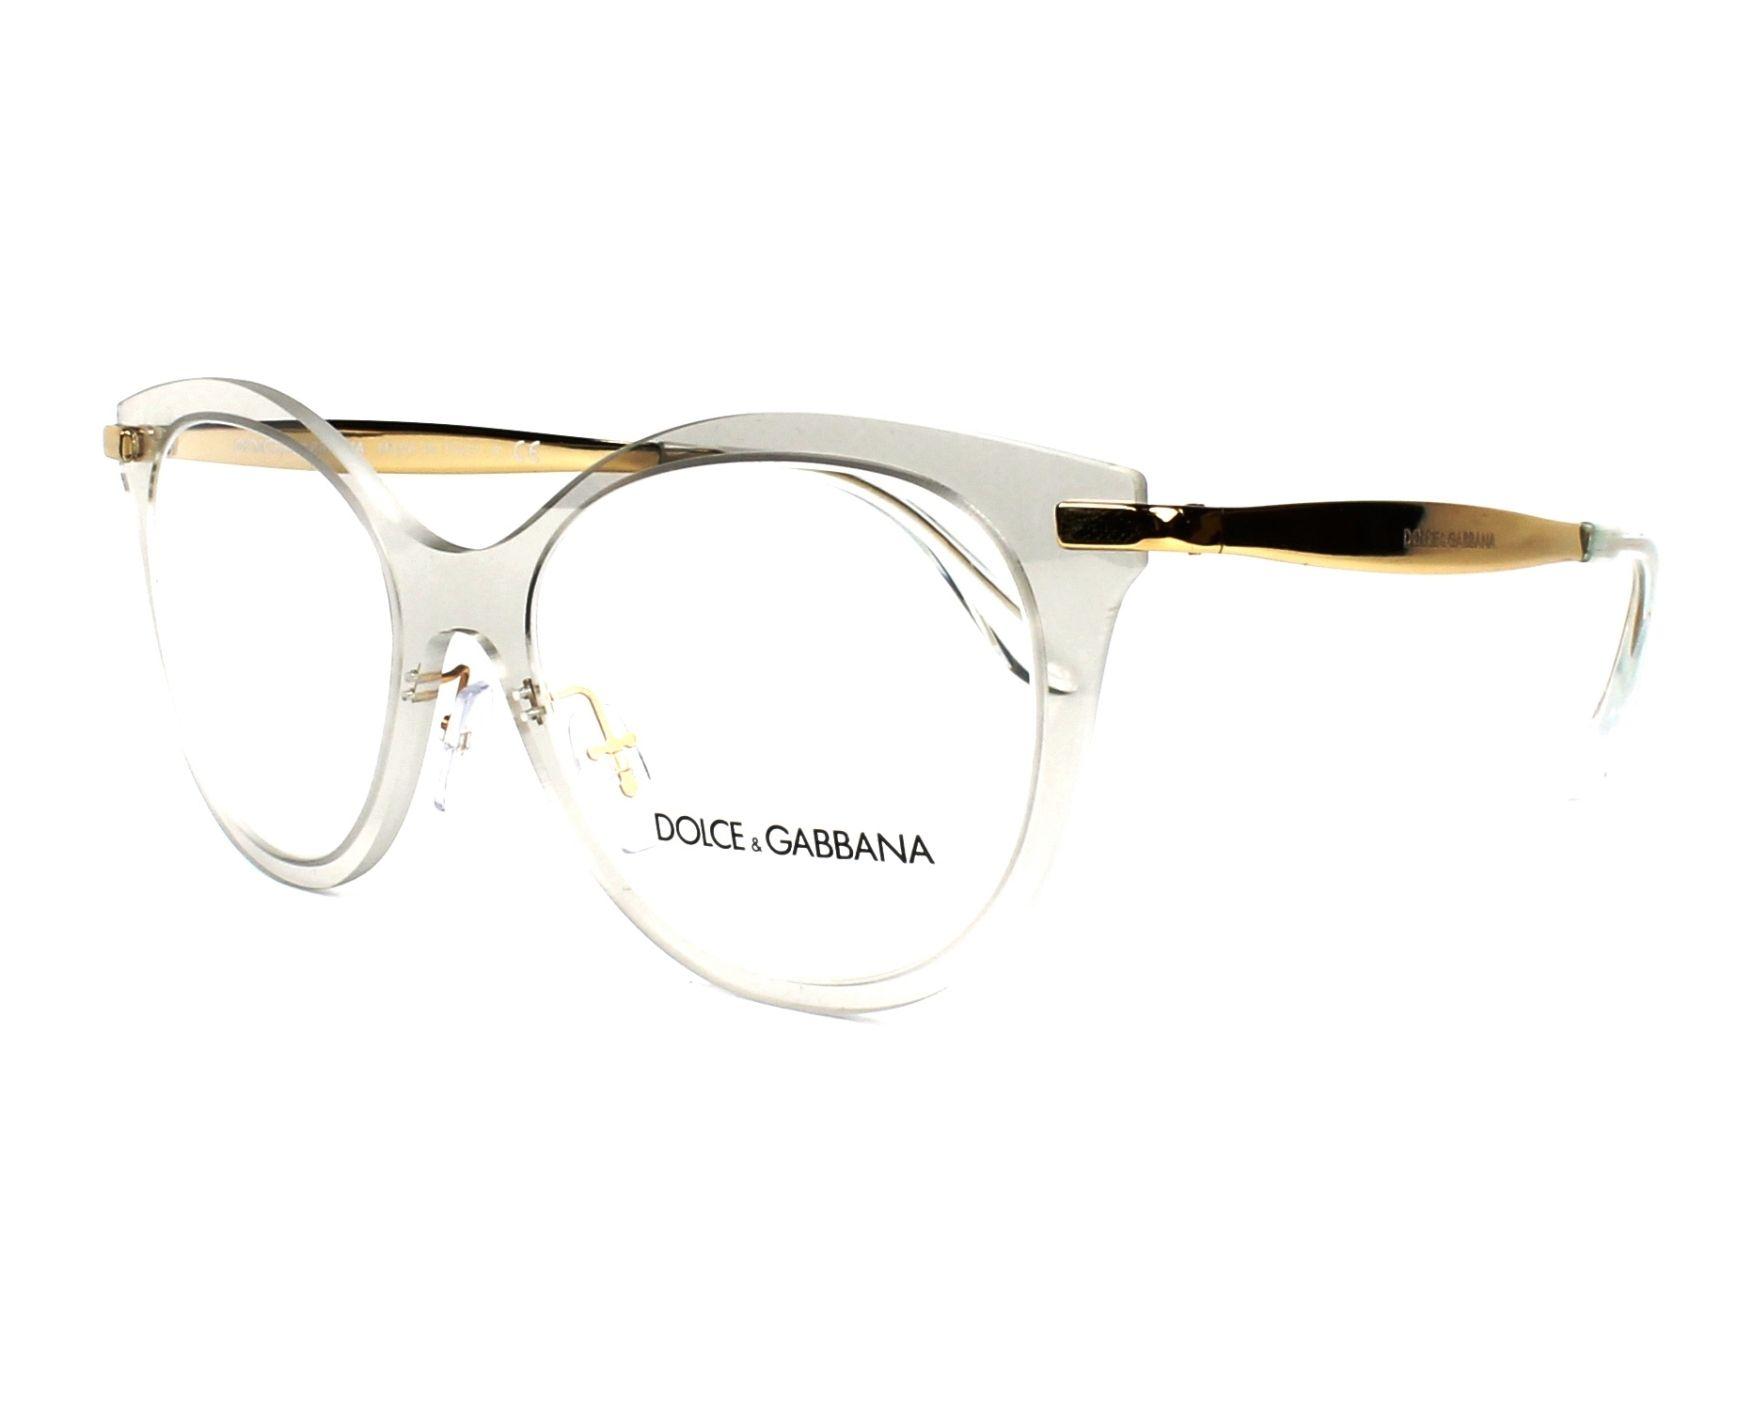 Dolce & Gabbana Eyeglasses Crystal DG-1292 3073 - Visionet US